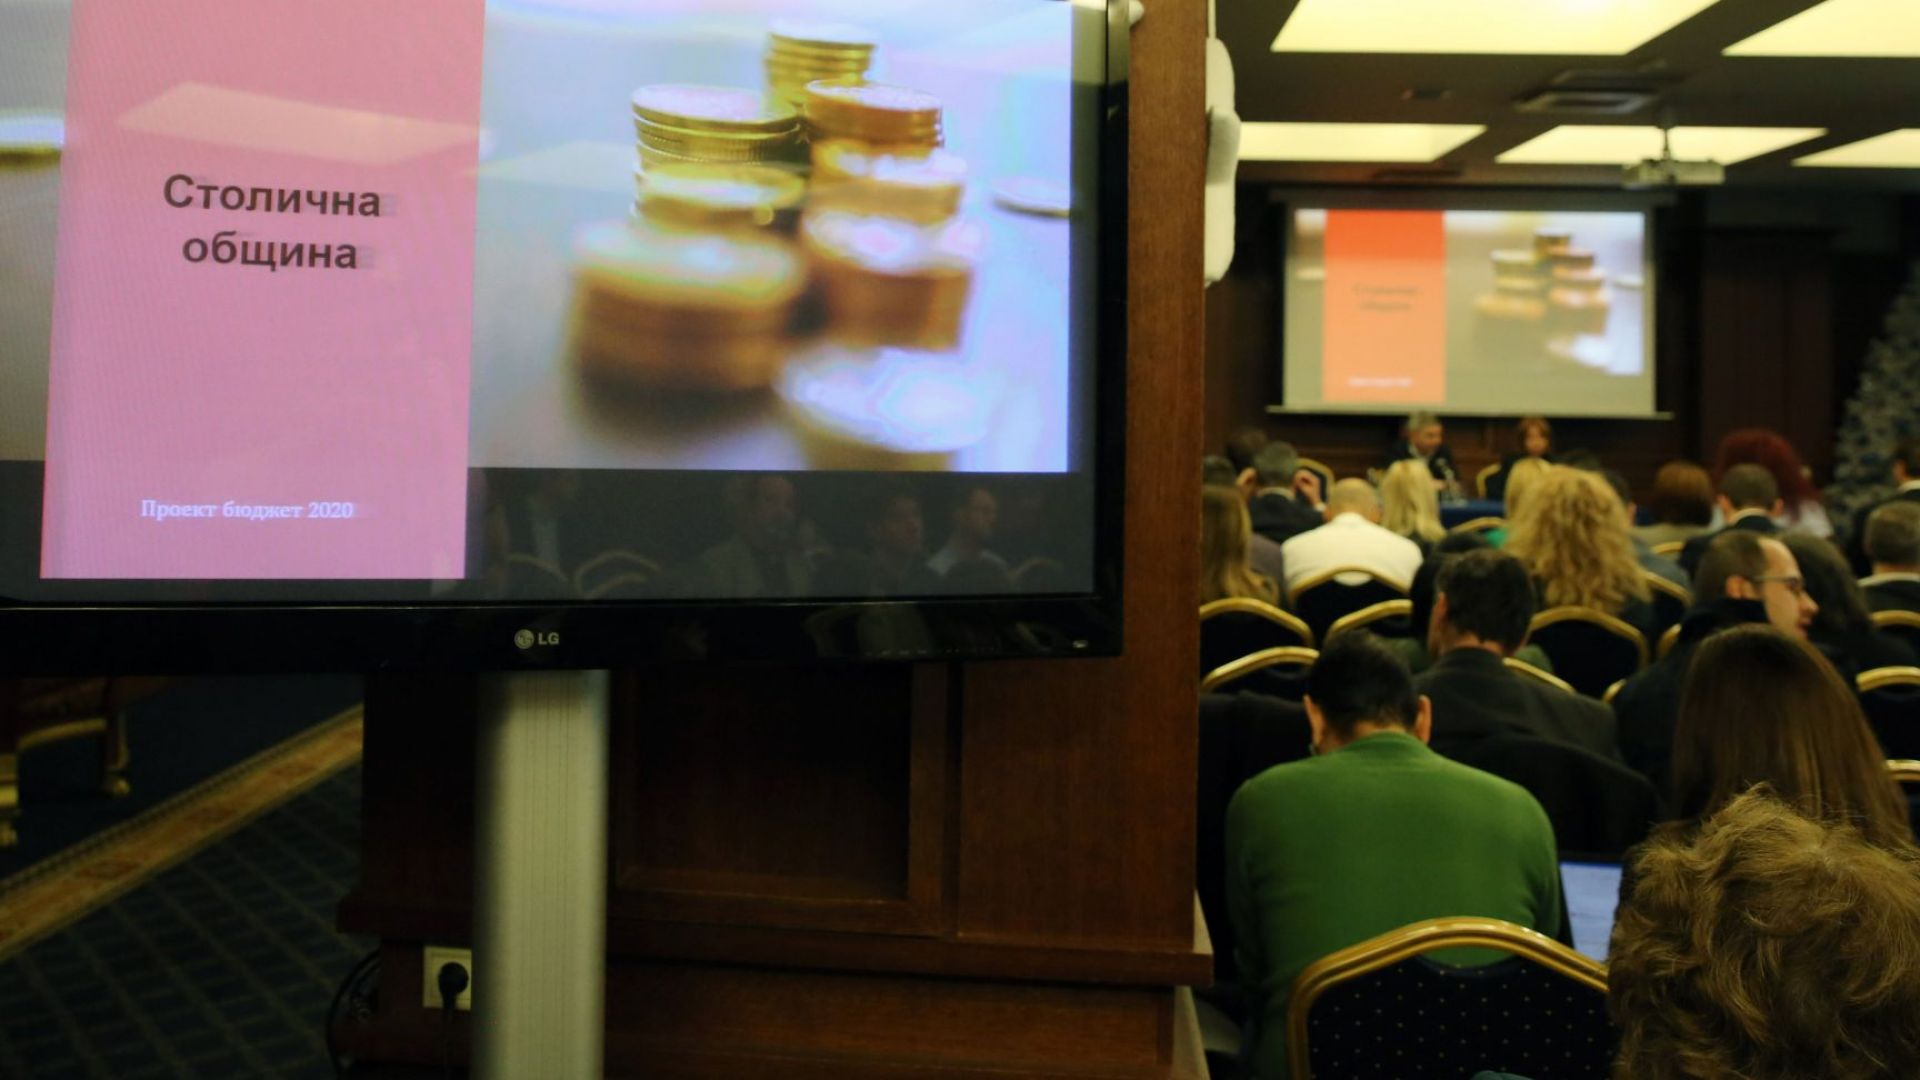 След 6-часов дебат приеха рекордния бюджет на София